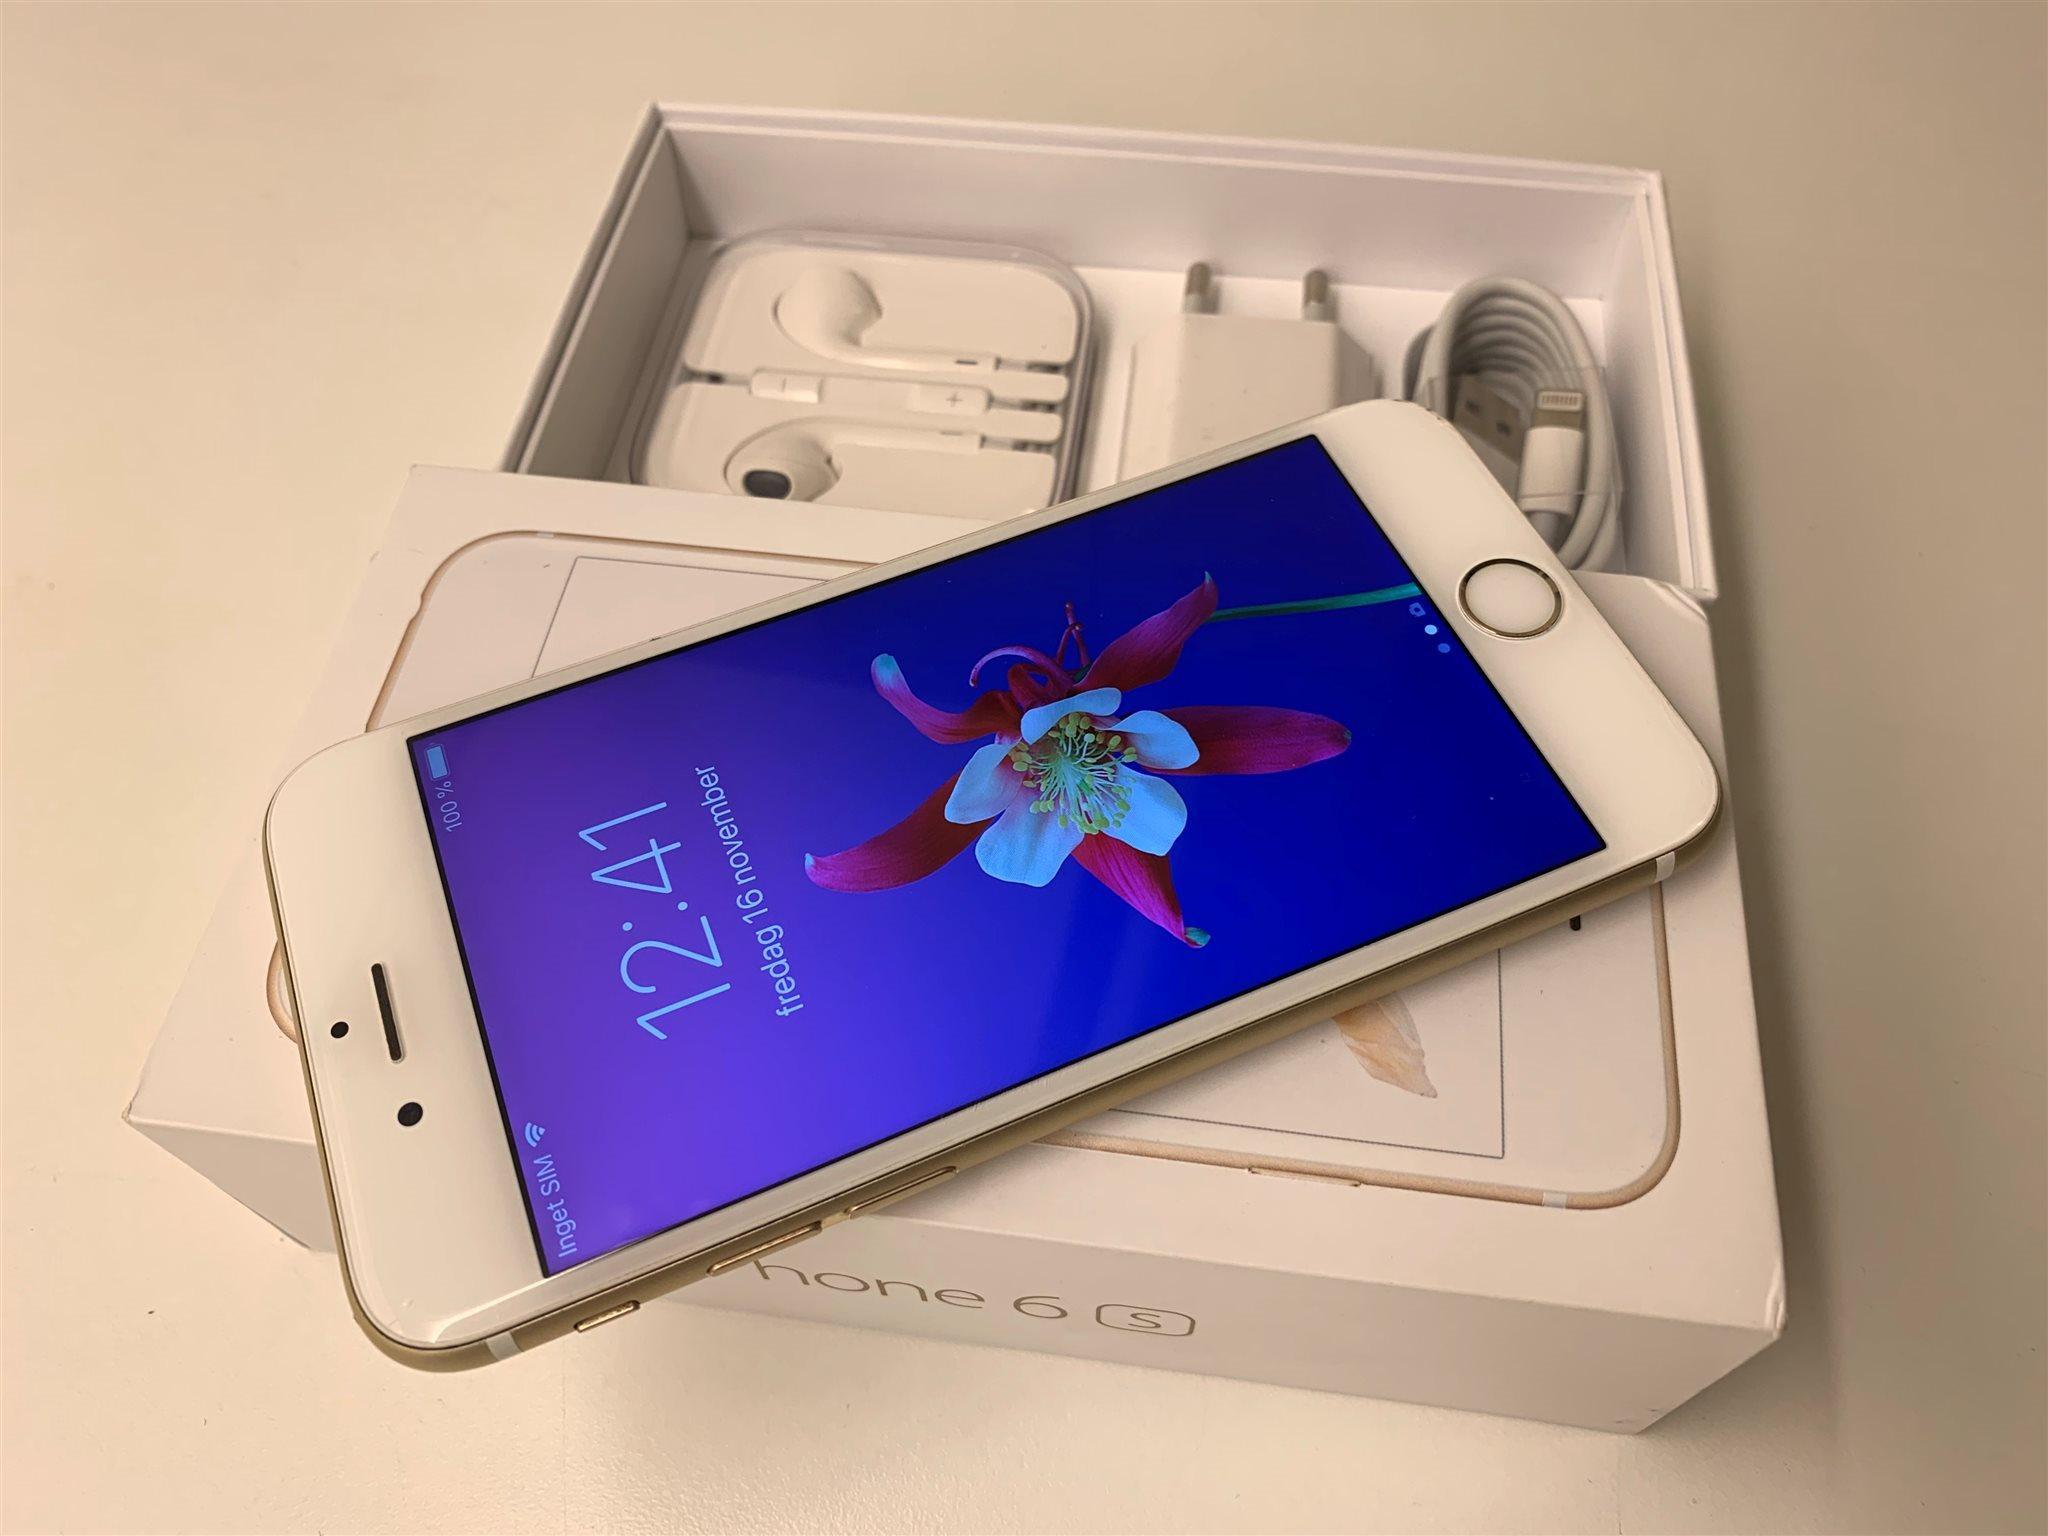 Apple iPhone 6s Gold 64GB STORT MINNE Originallåda Nya tillbehör   OLÅST   6f6feeeba3503